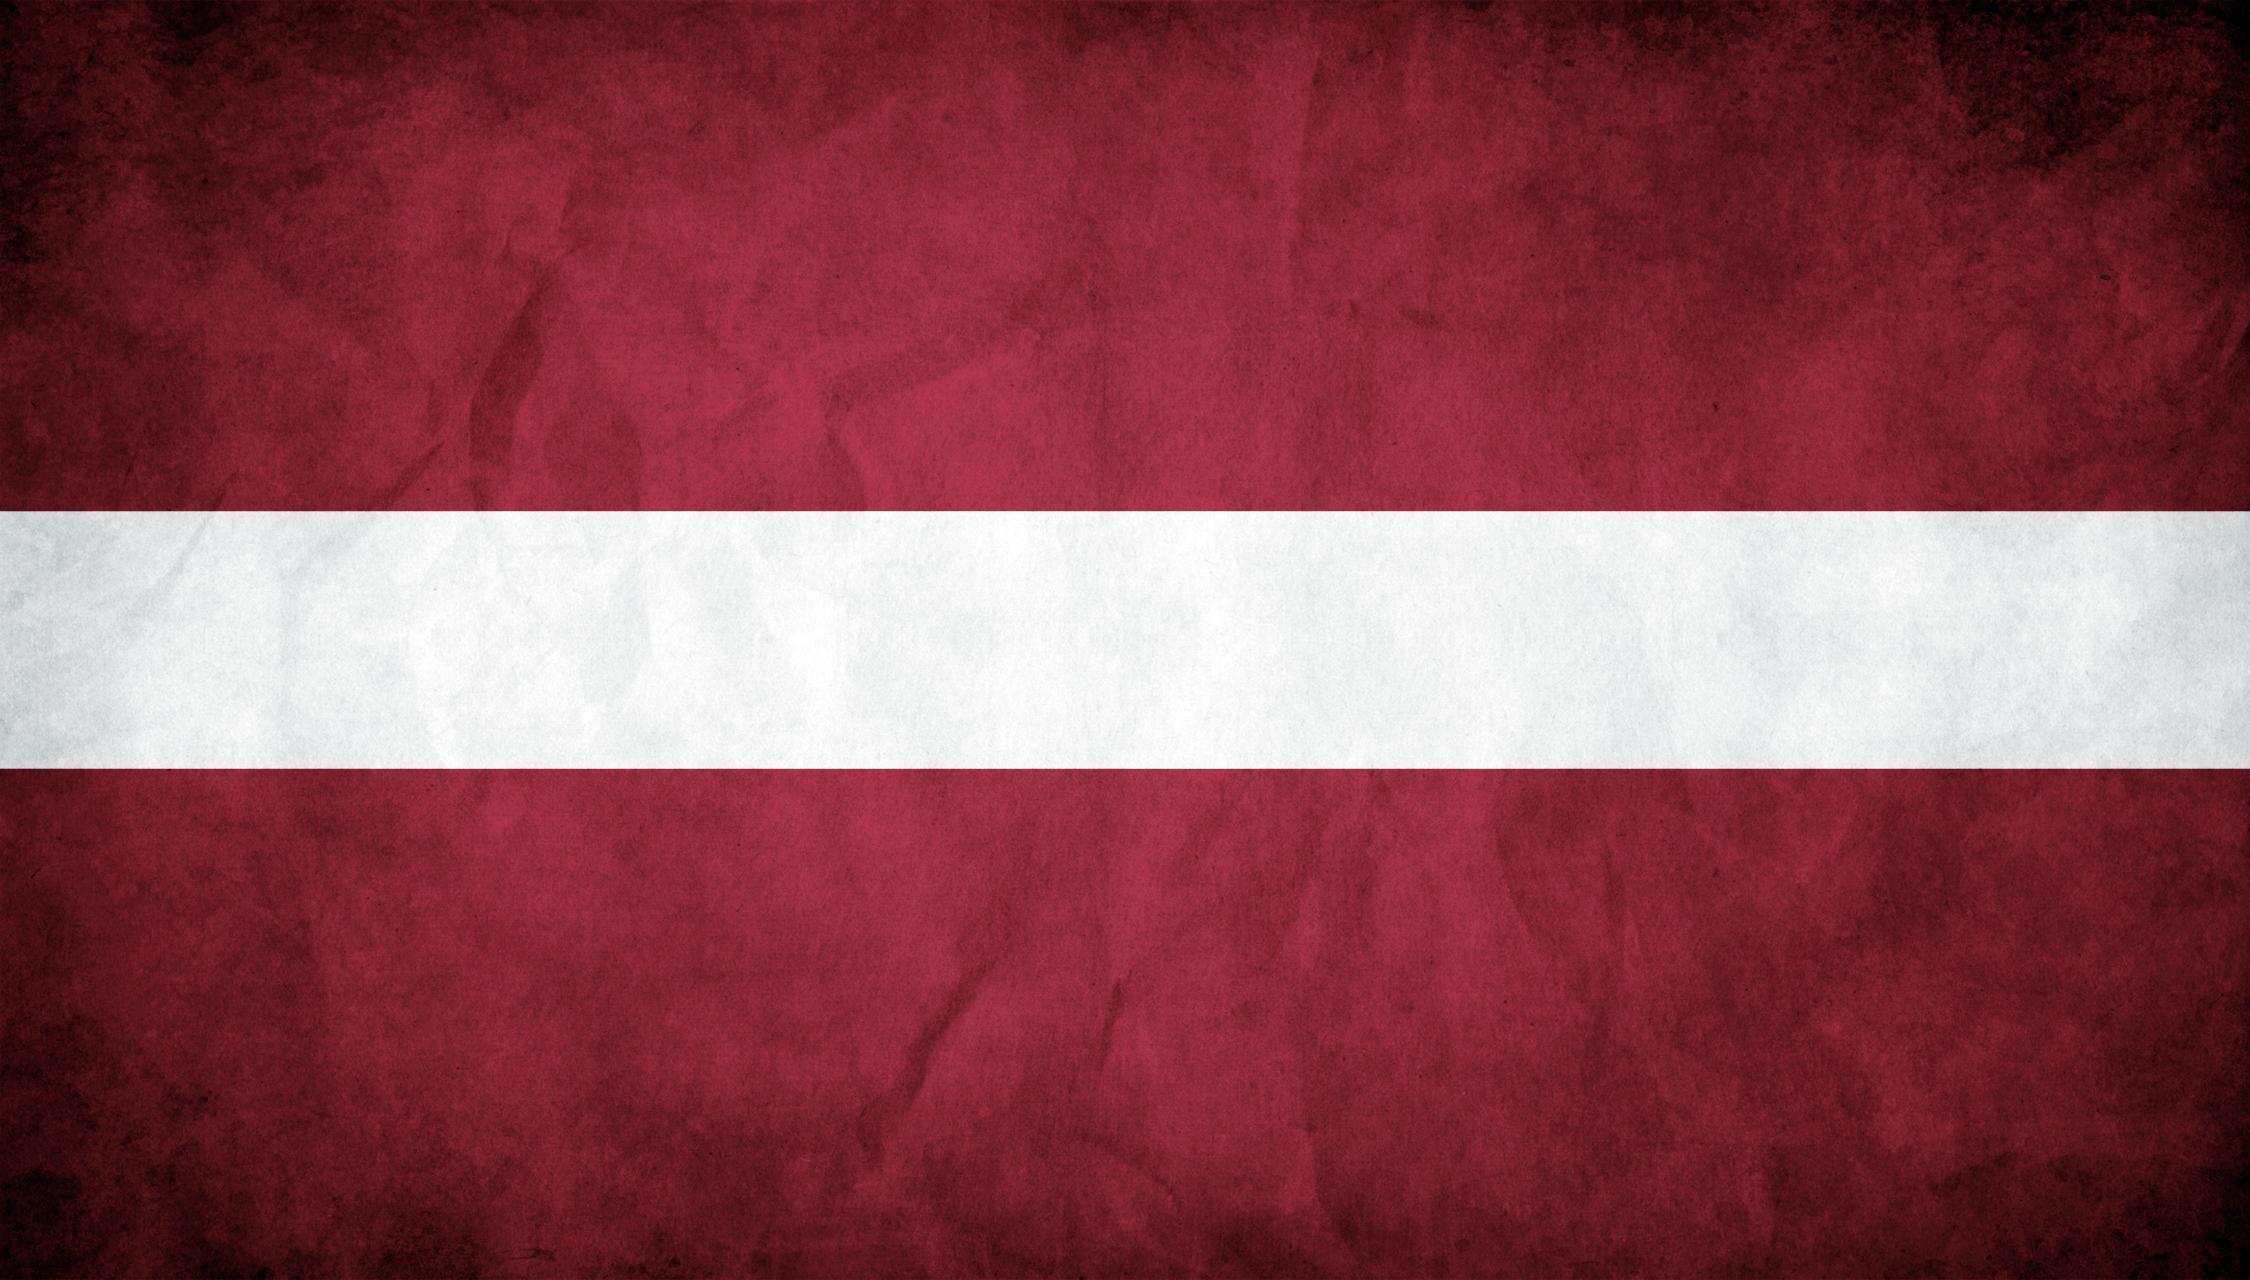 latvia flag wallpaper 52178